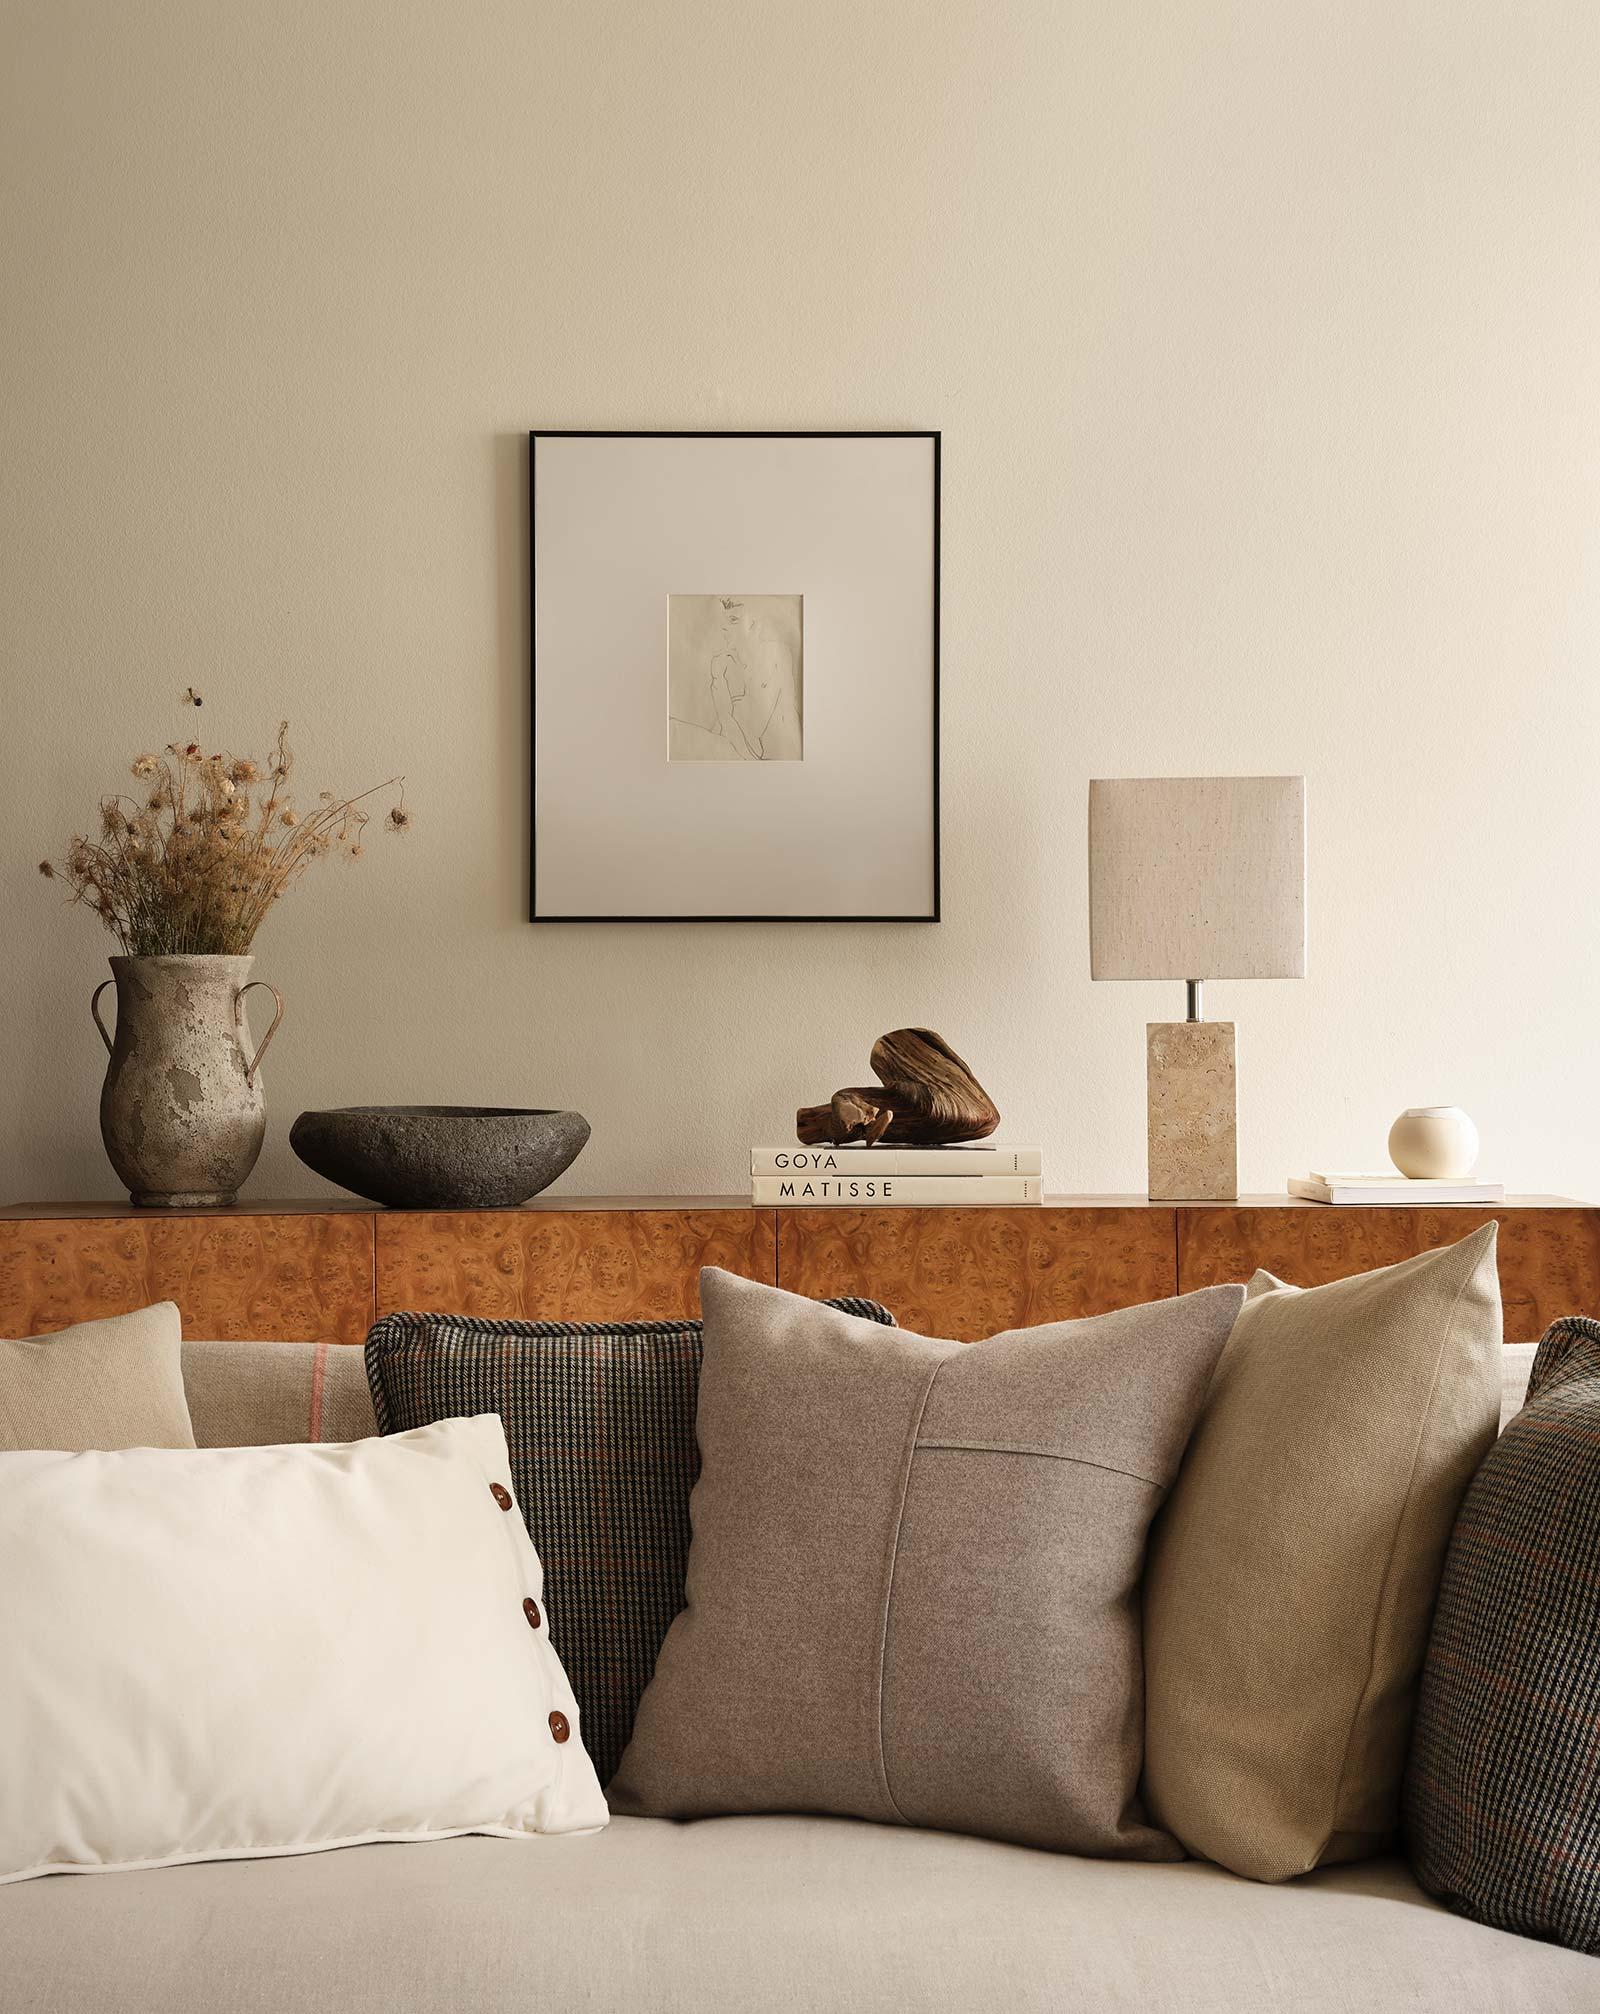 Zara Home FW 2019 living room cushion